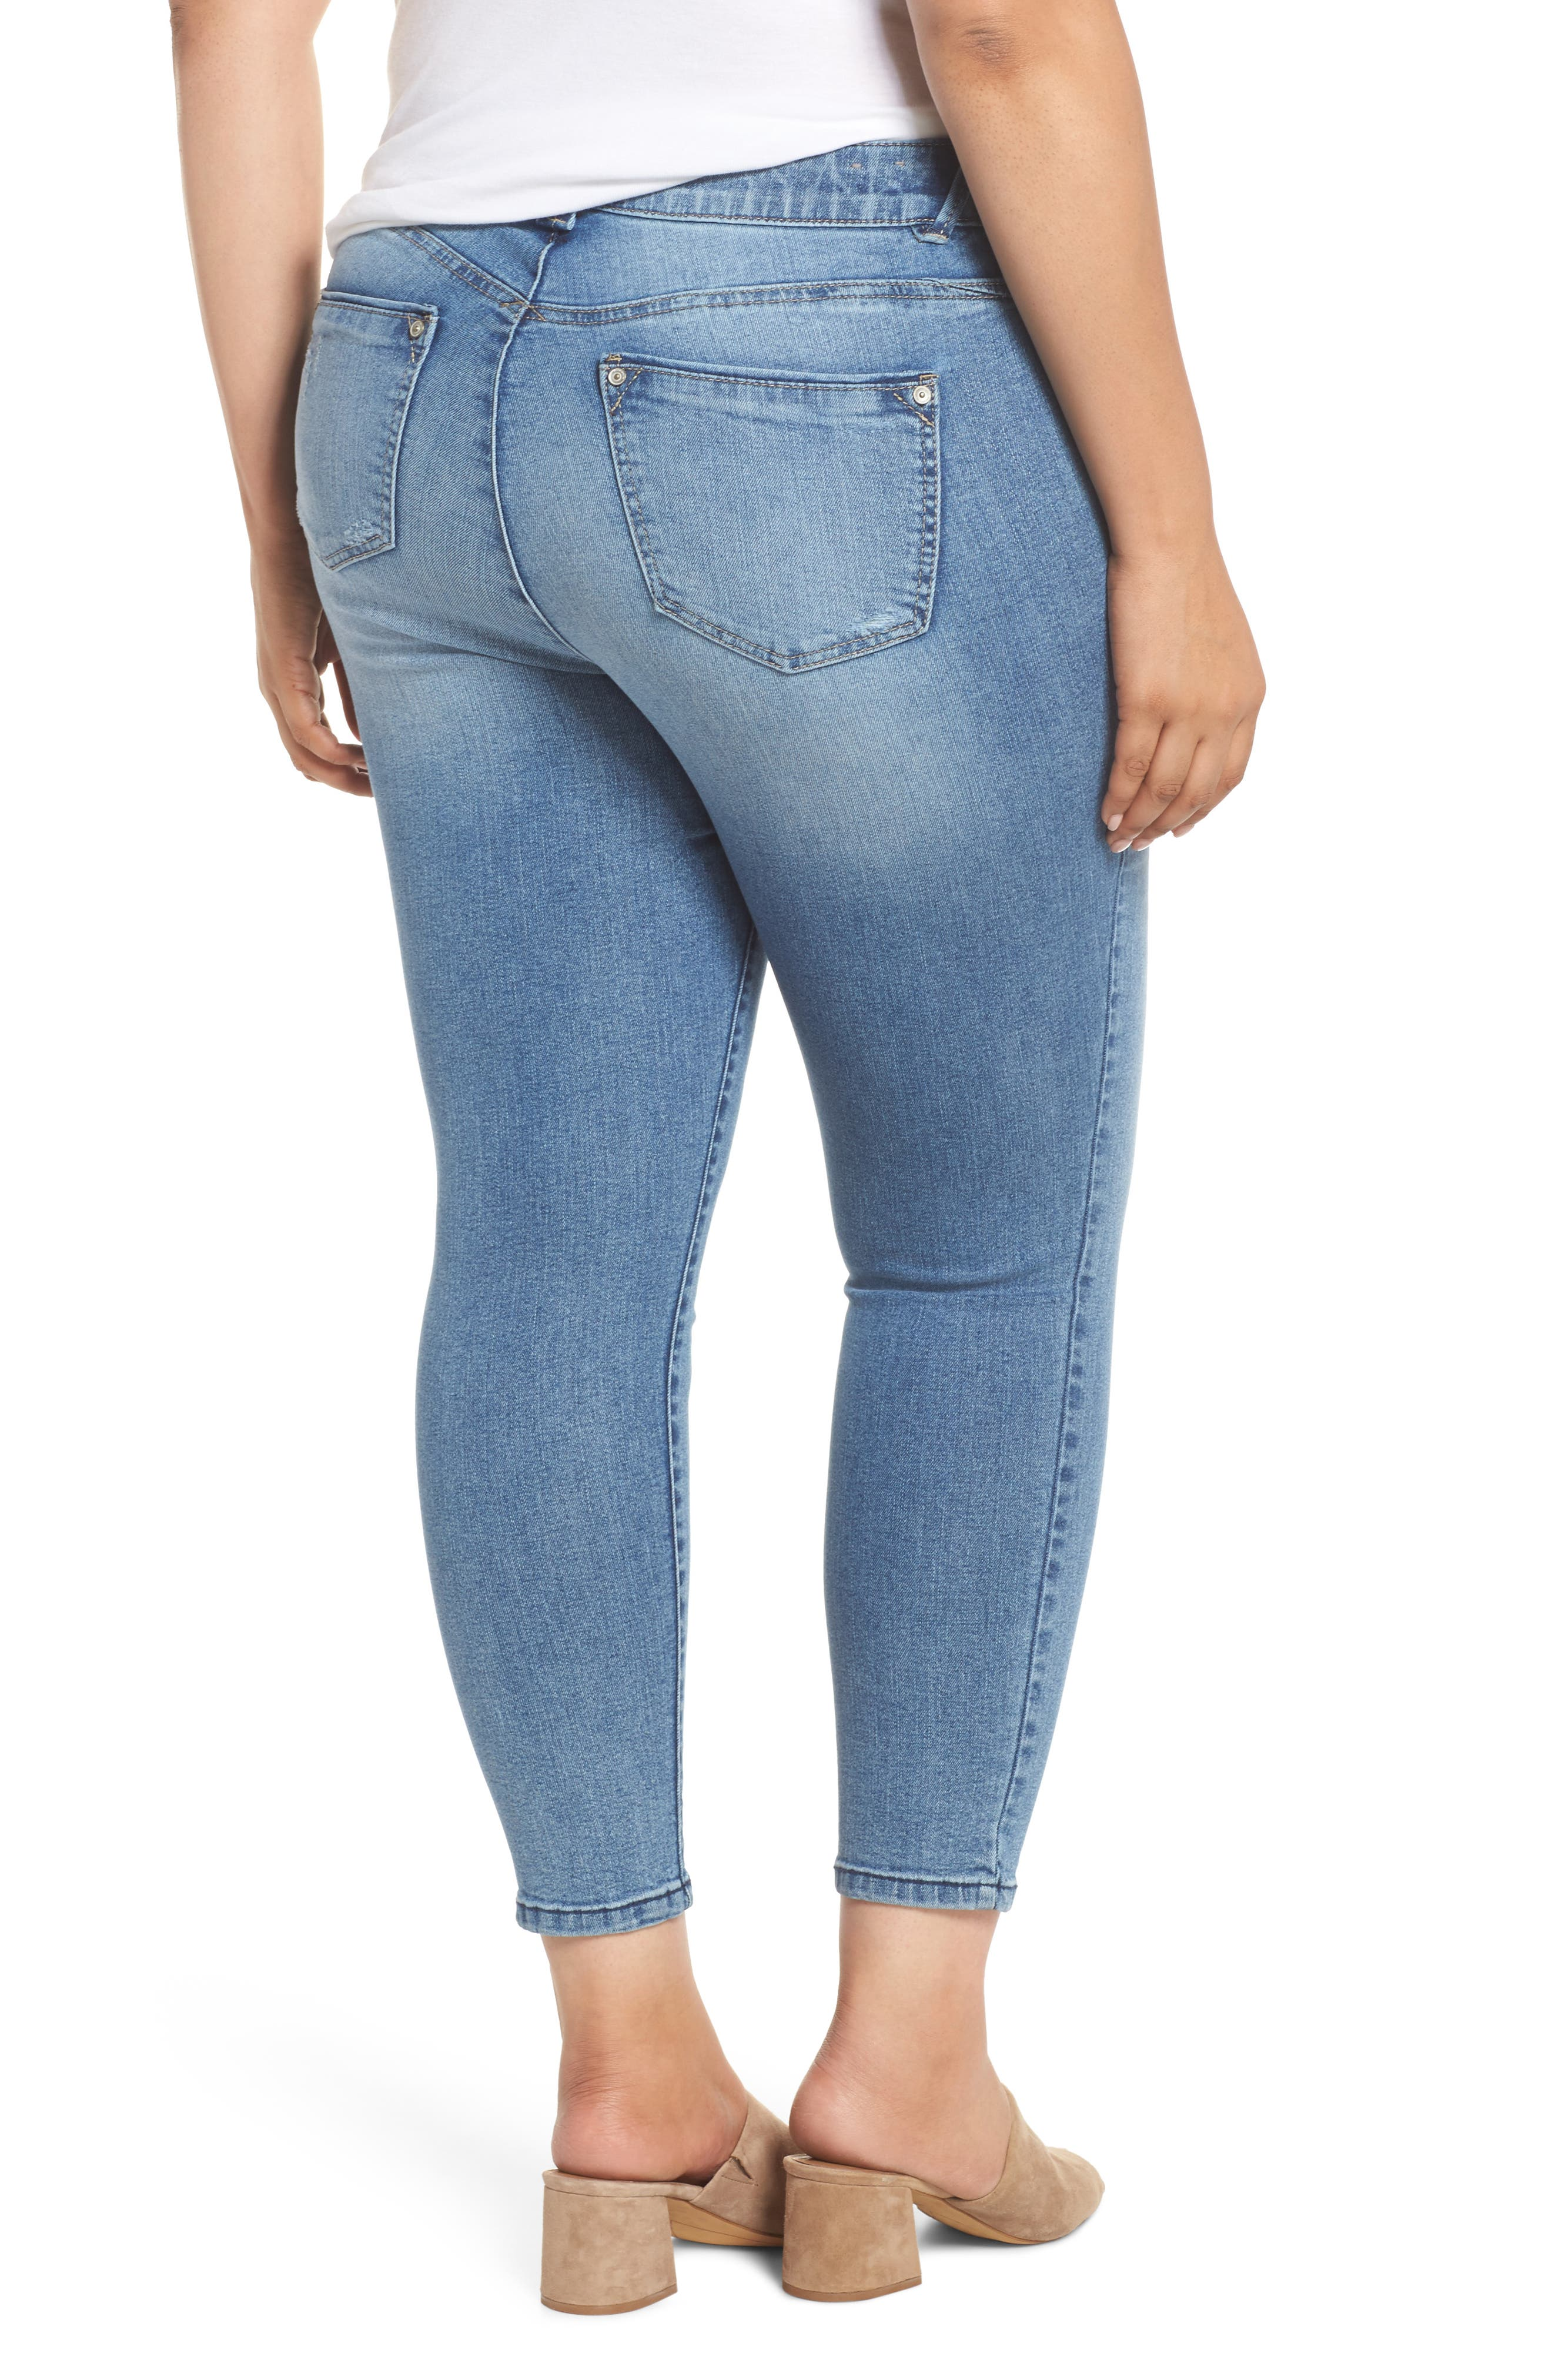 Ab-solution Stretch Ankle Skimmer Jeans,                             Alternate thumbnail 2, color,                             Light Blue